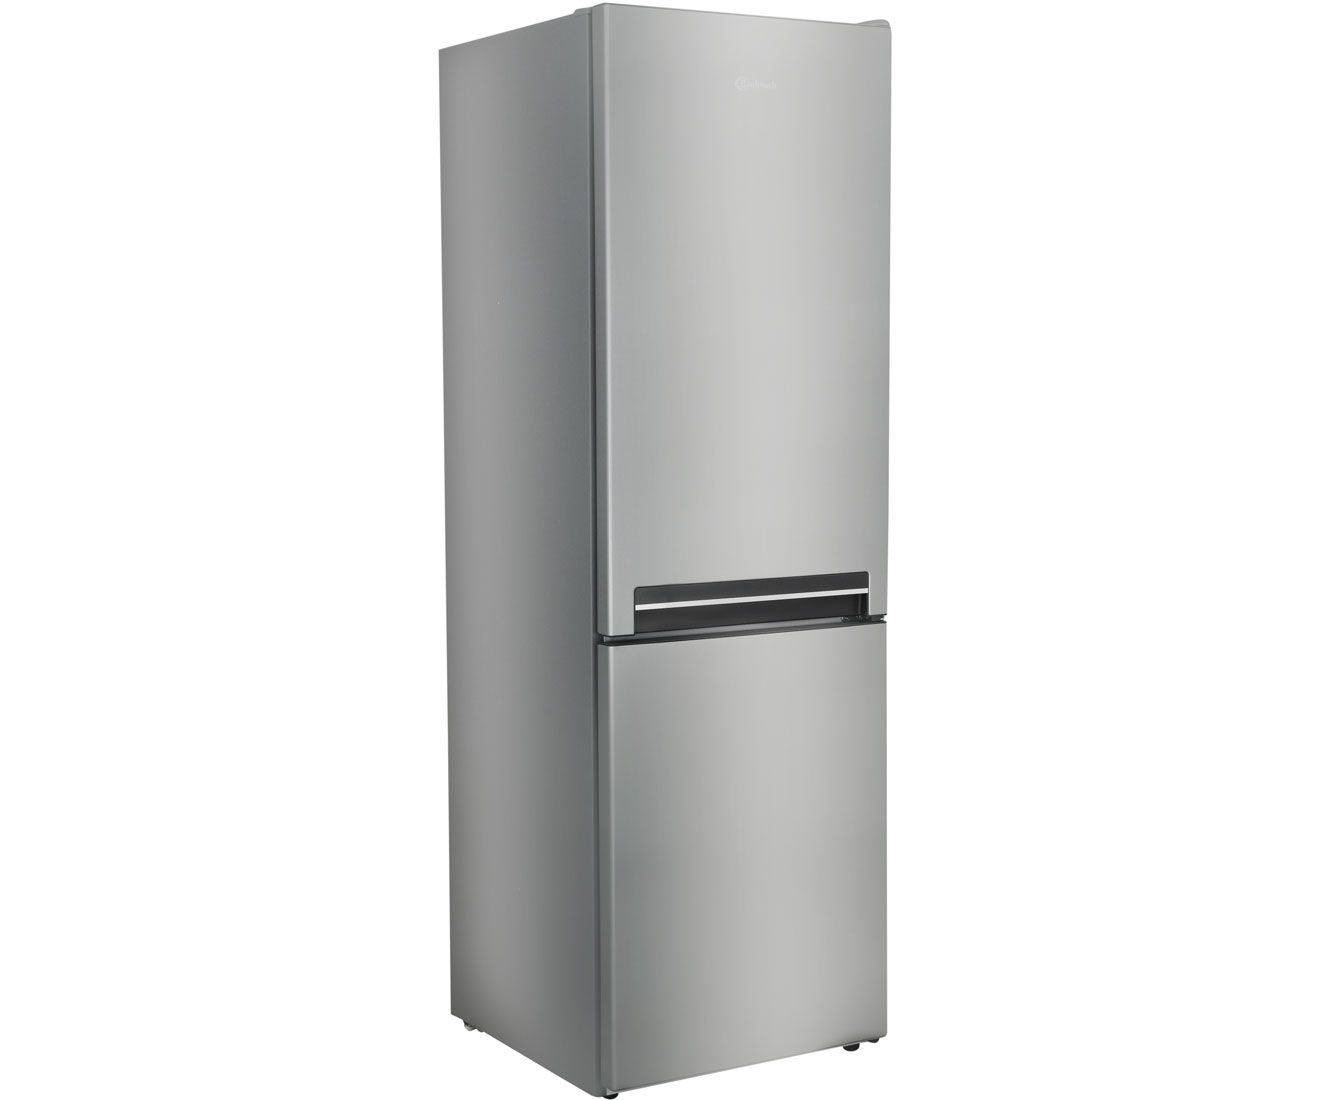 Kühlschrank Candy : Kühlschrank candy kühlt nicht opel frigidaire kühlschrank baujahr